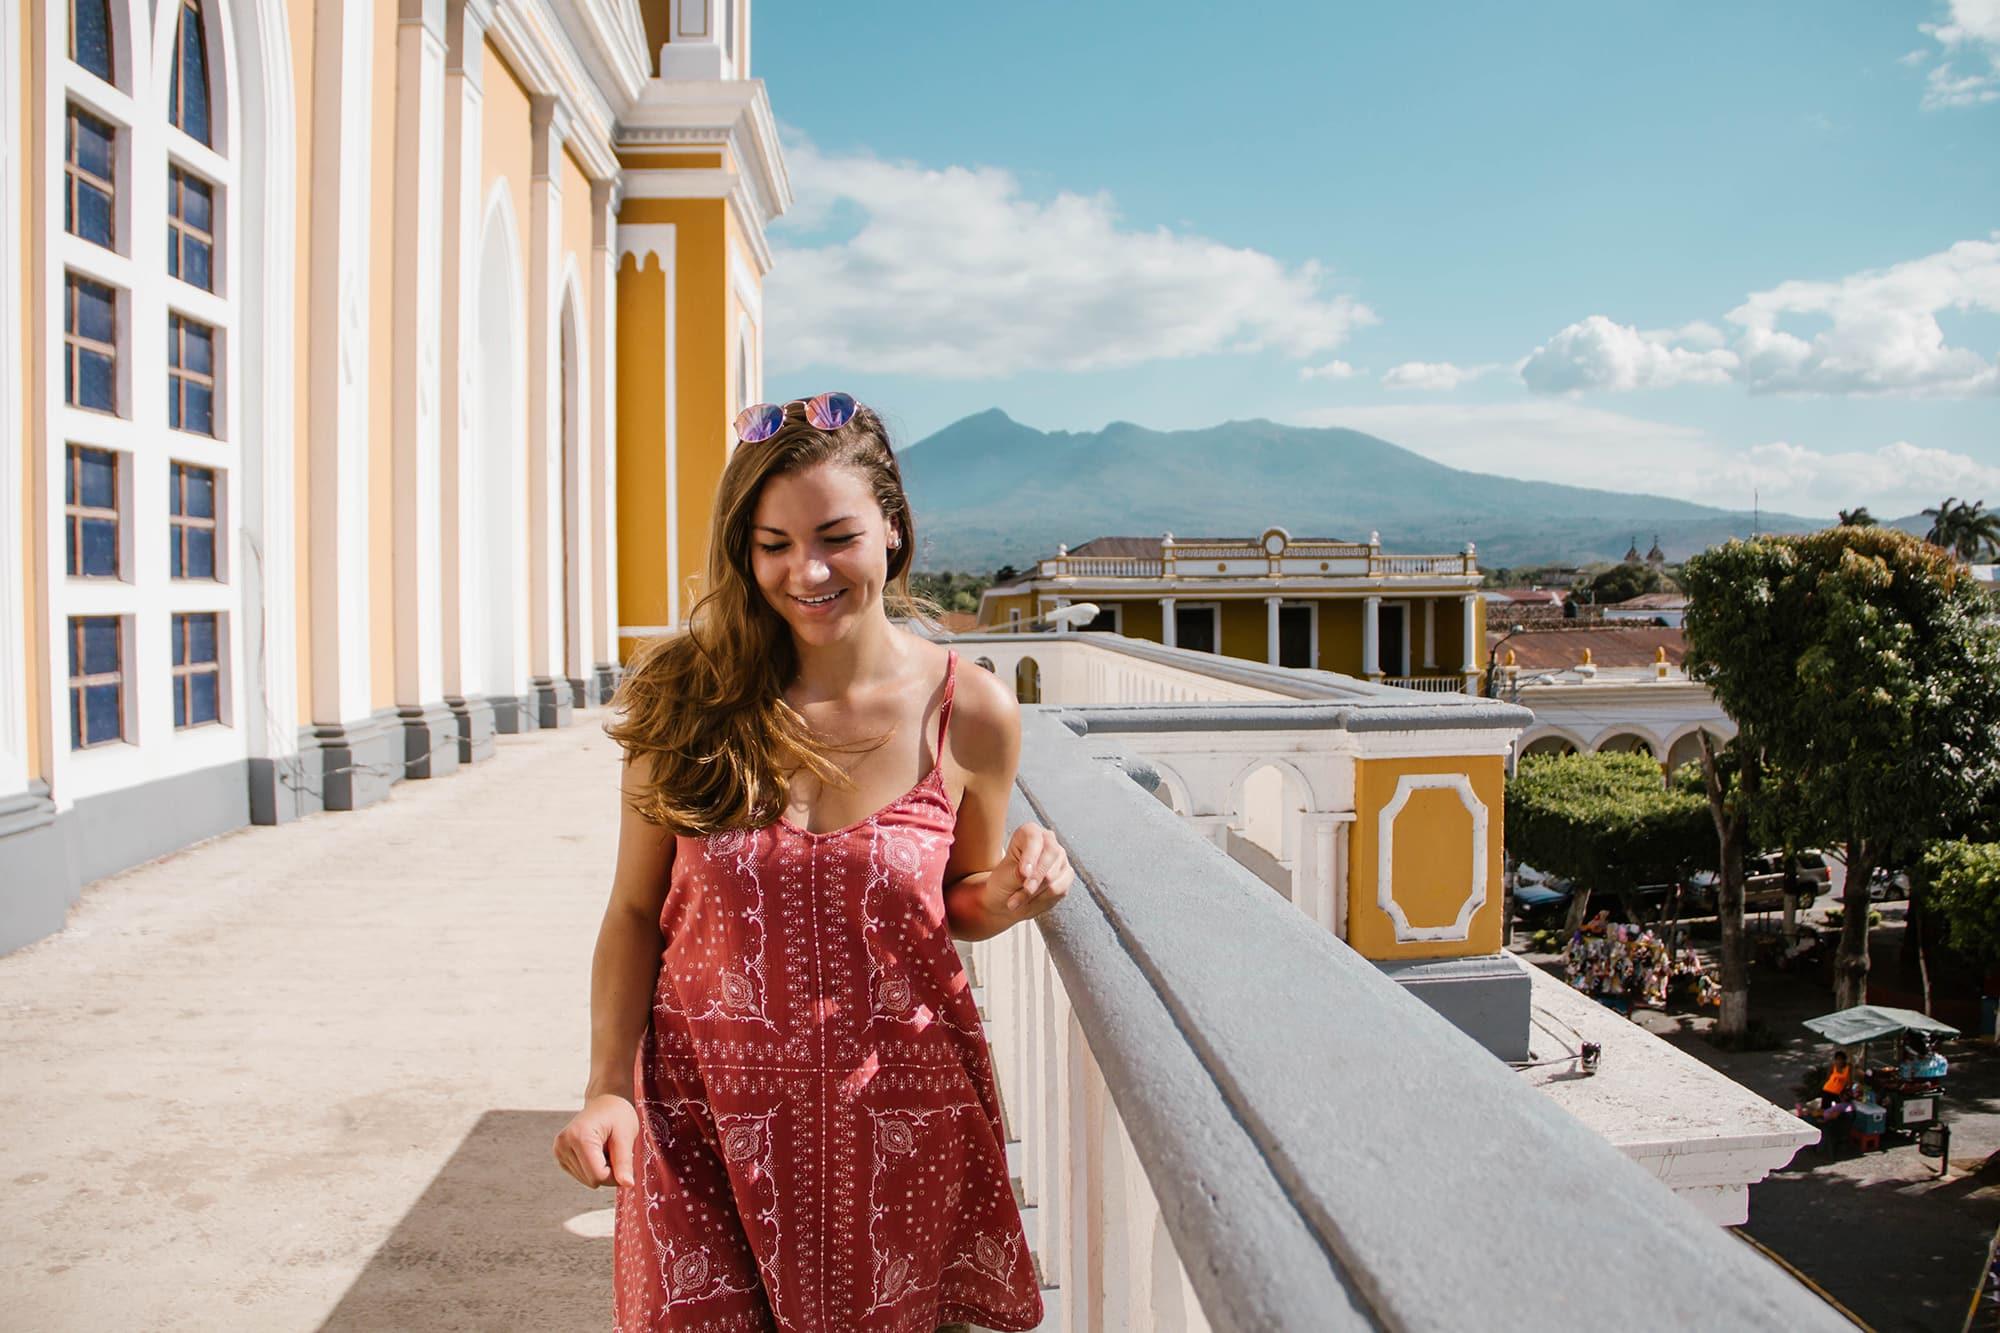 Erica Latack in Granada, Nicaragua